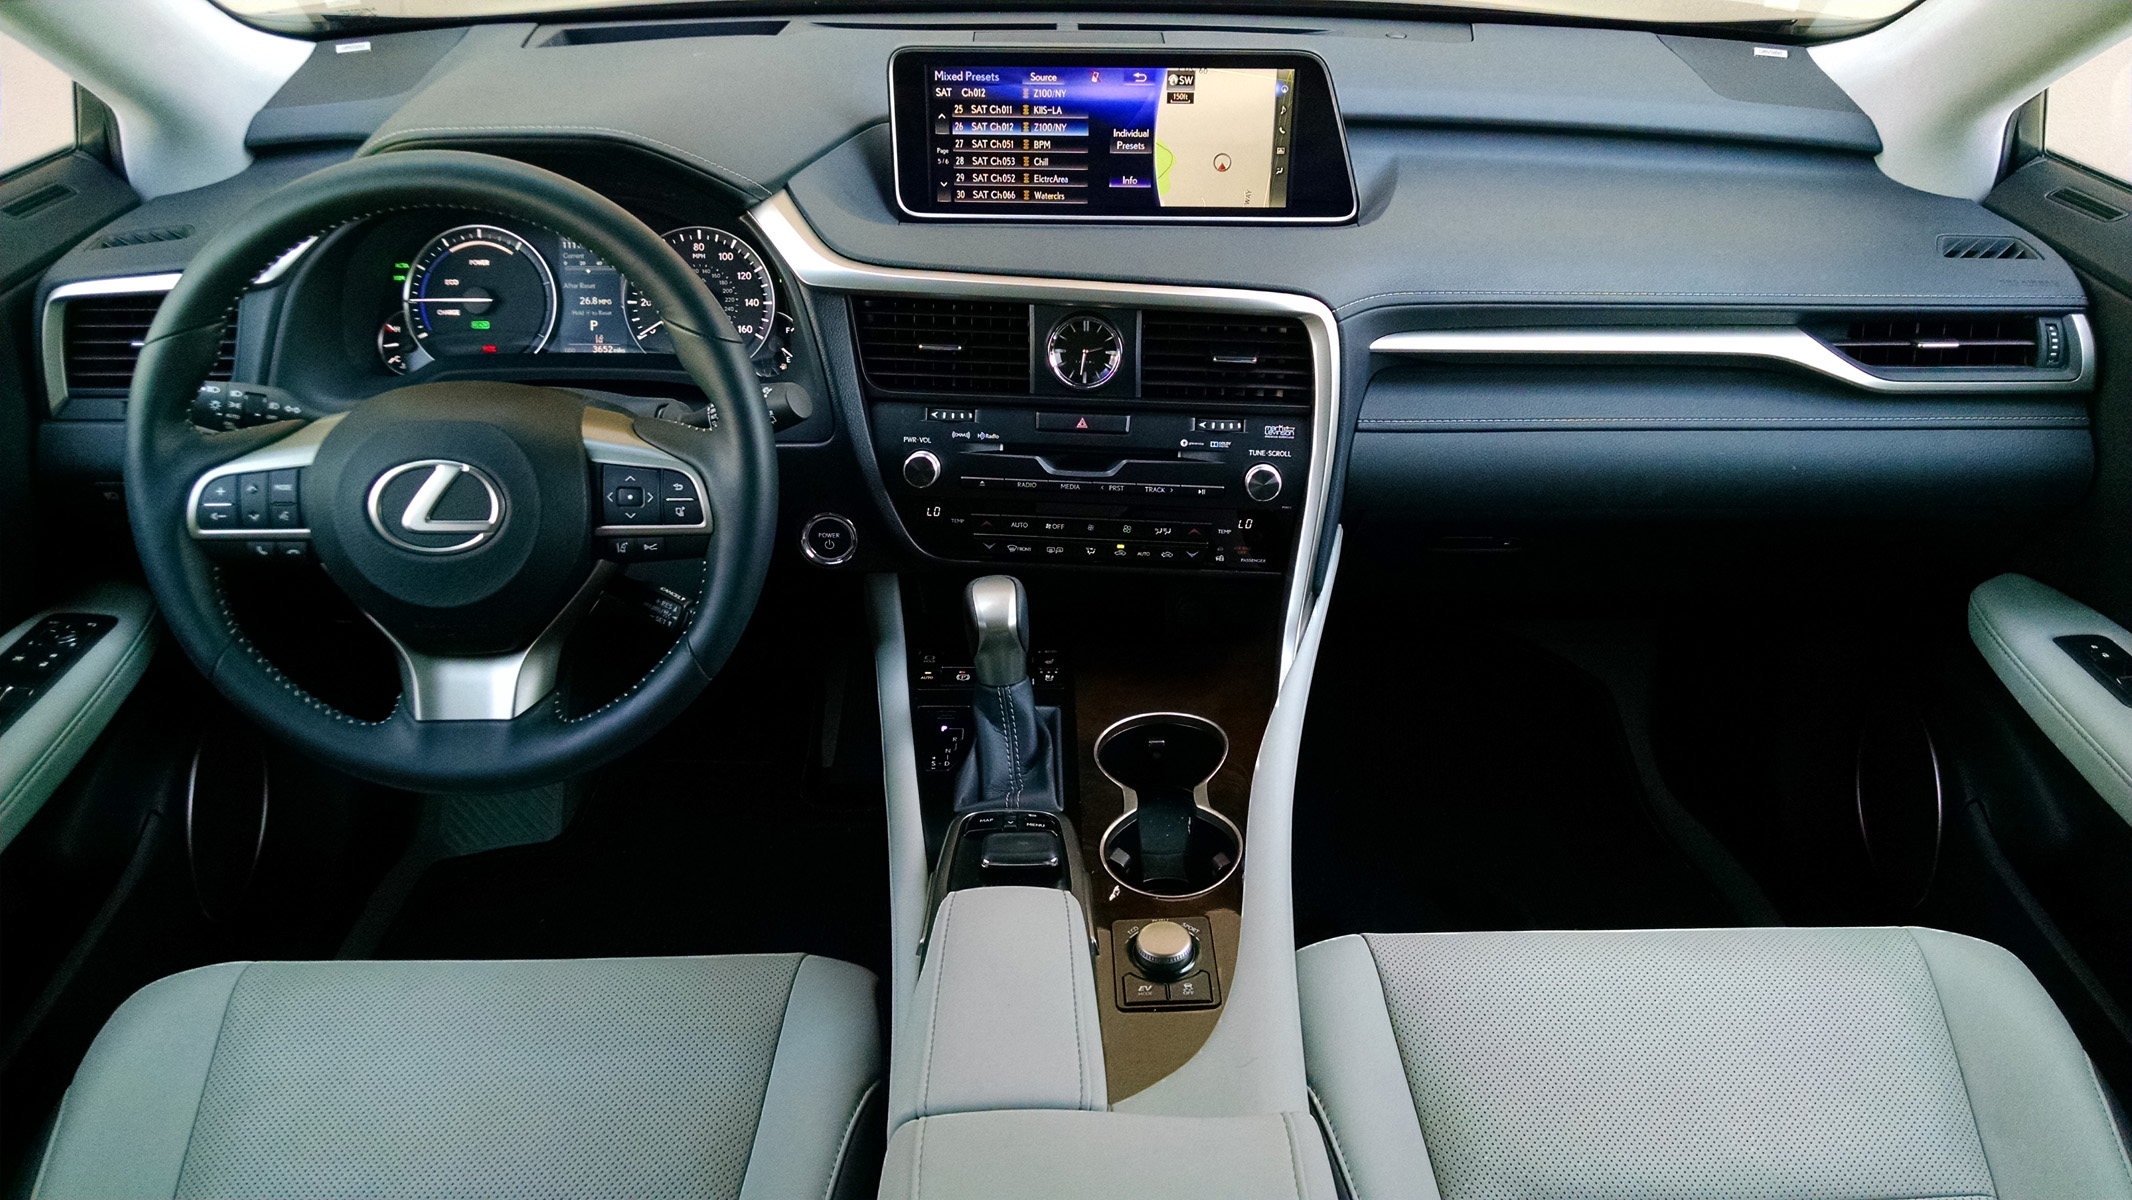 First Drive: 2016 Lexus RX450h Hybrid - TestDriven.TV